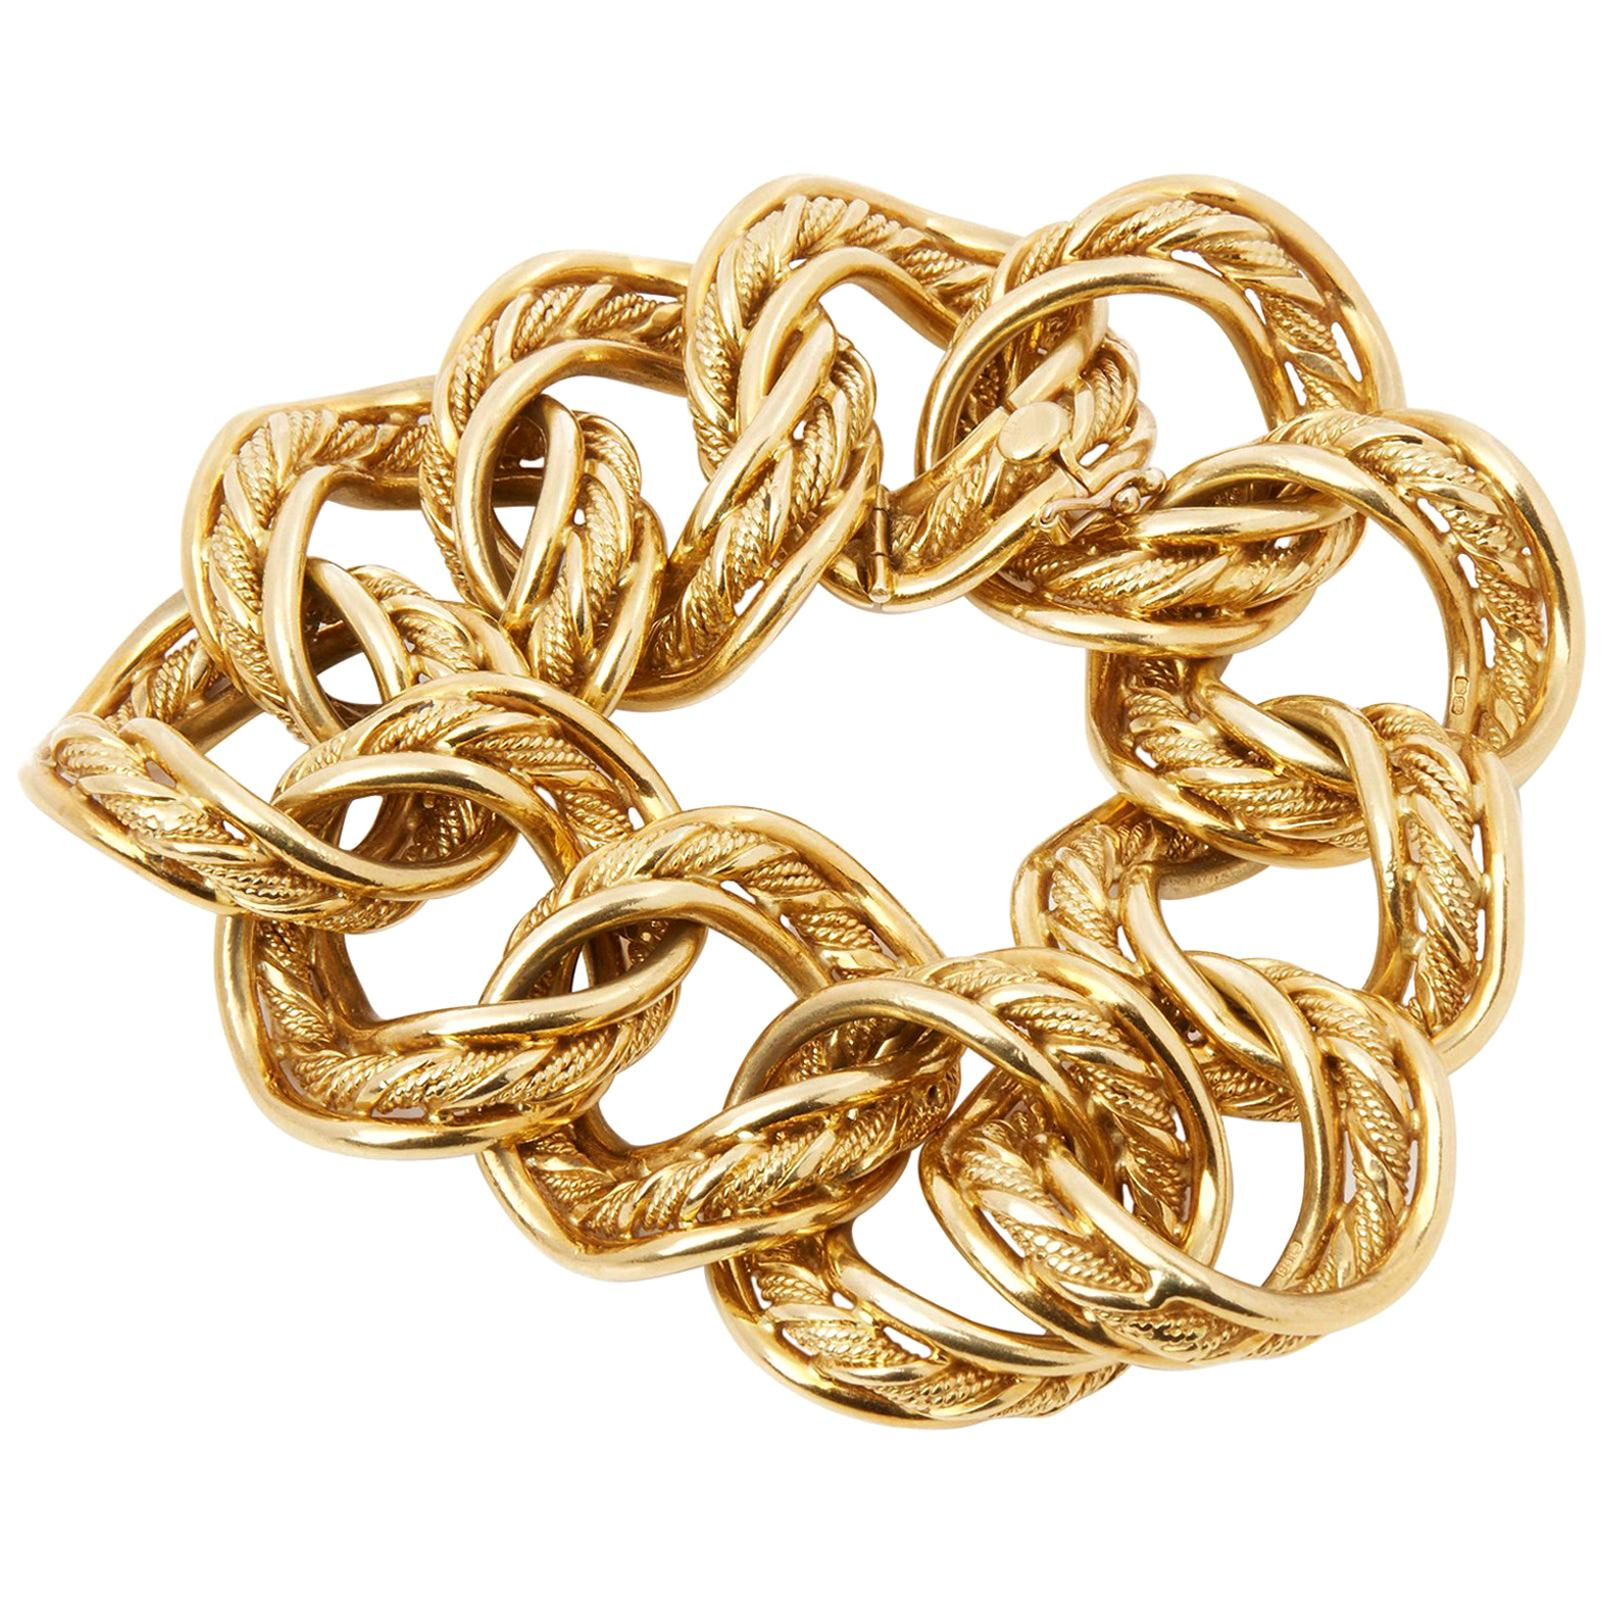 Kutchinsky 18 Karat Yellow Gold 1960s Heavy Link Vintage Bracelet